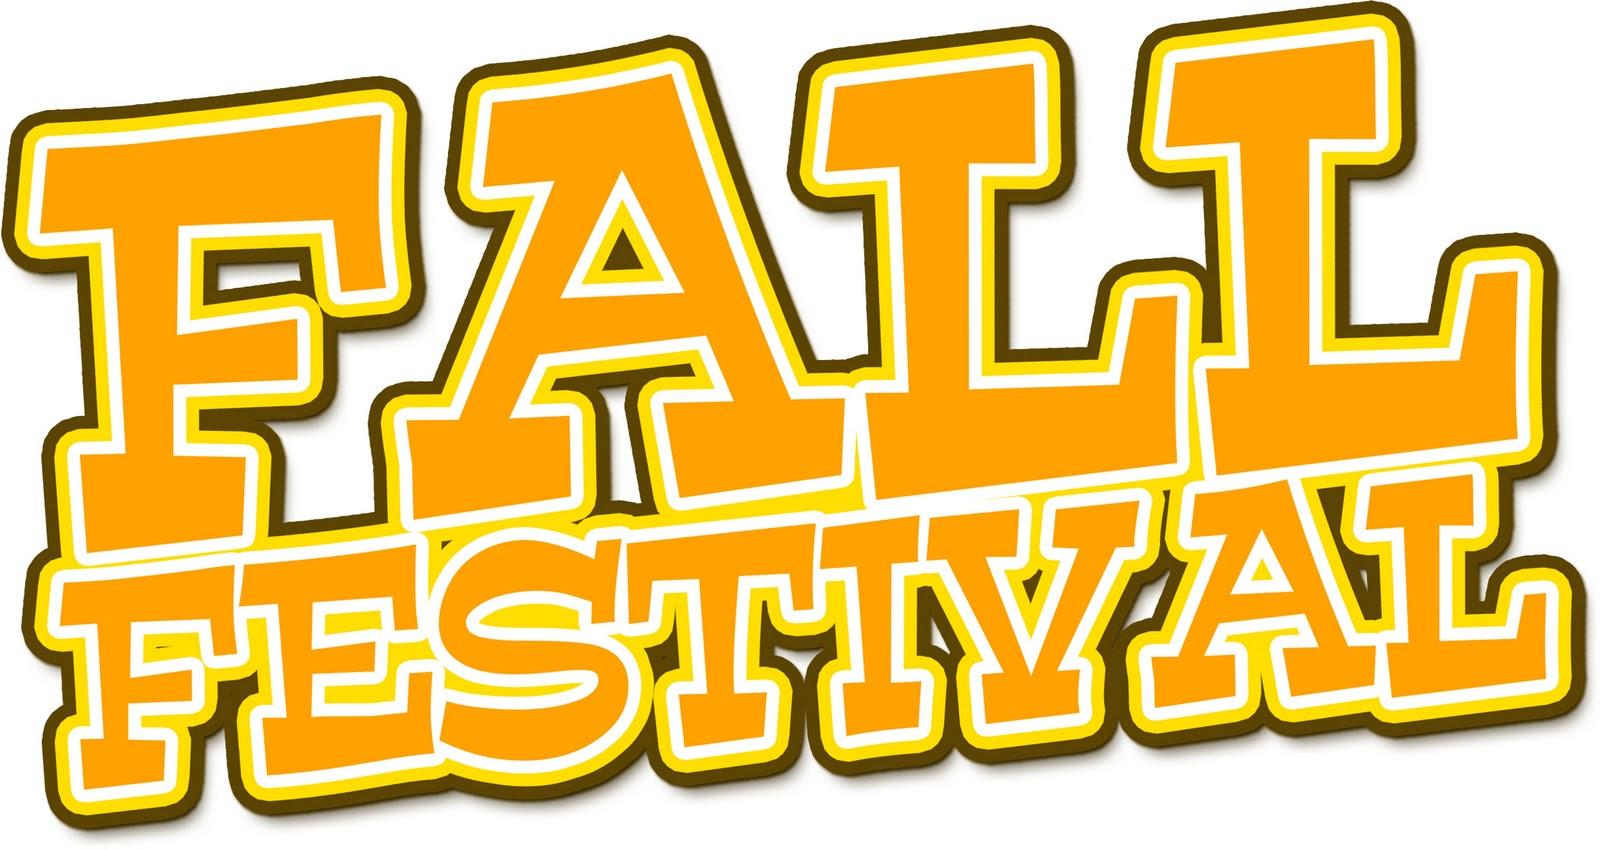 Fall Festival Community Festival Clipart-Fall festival community festival clipart-8